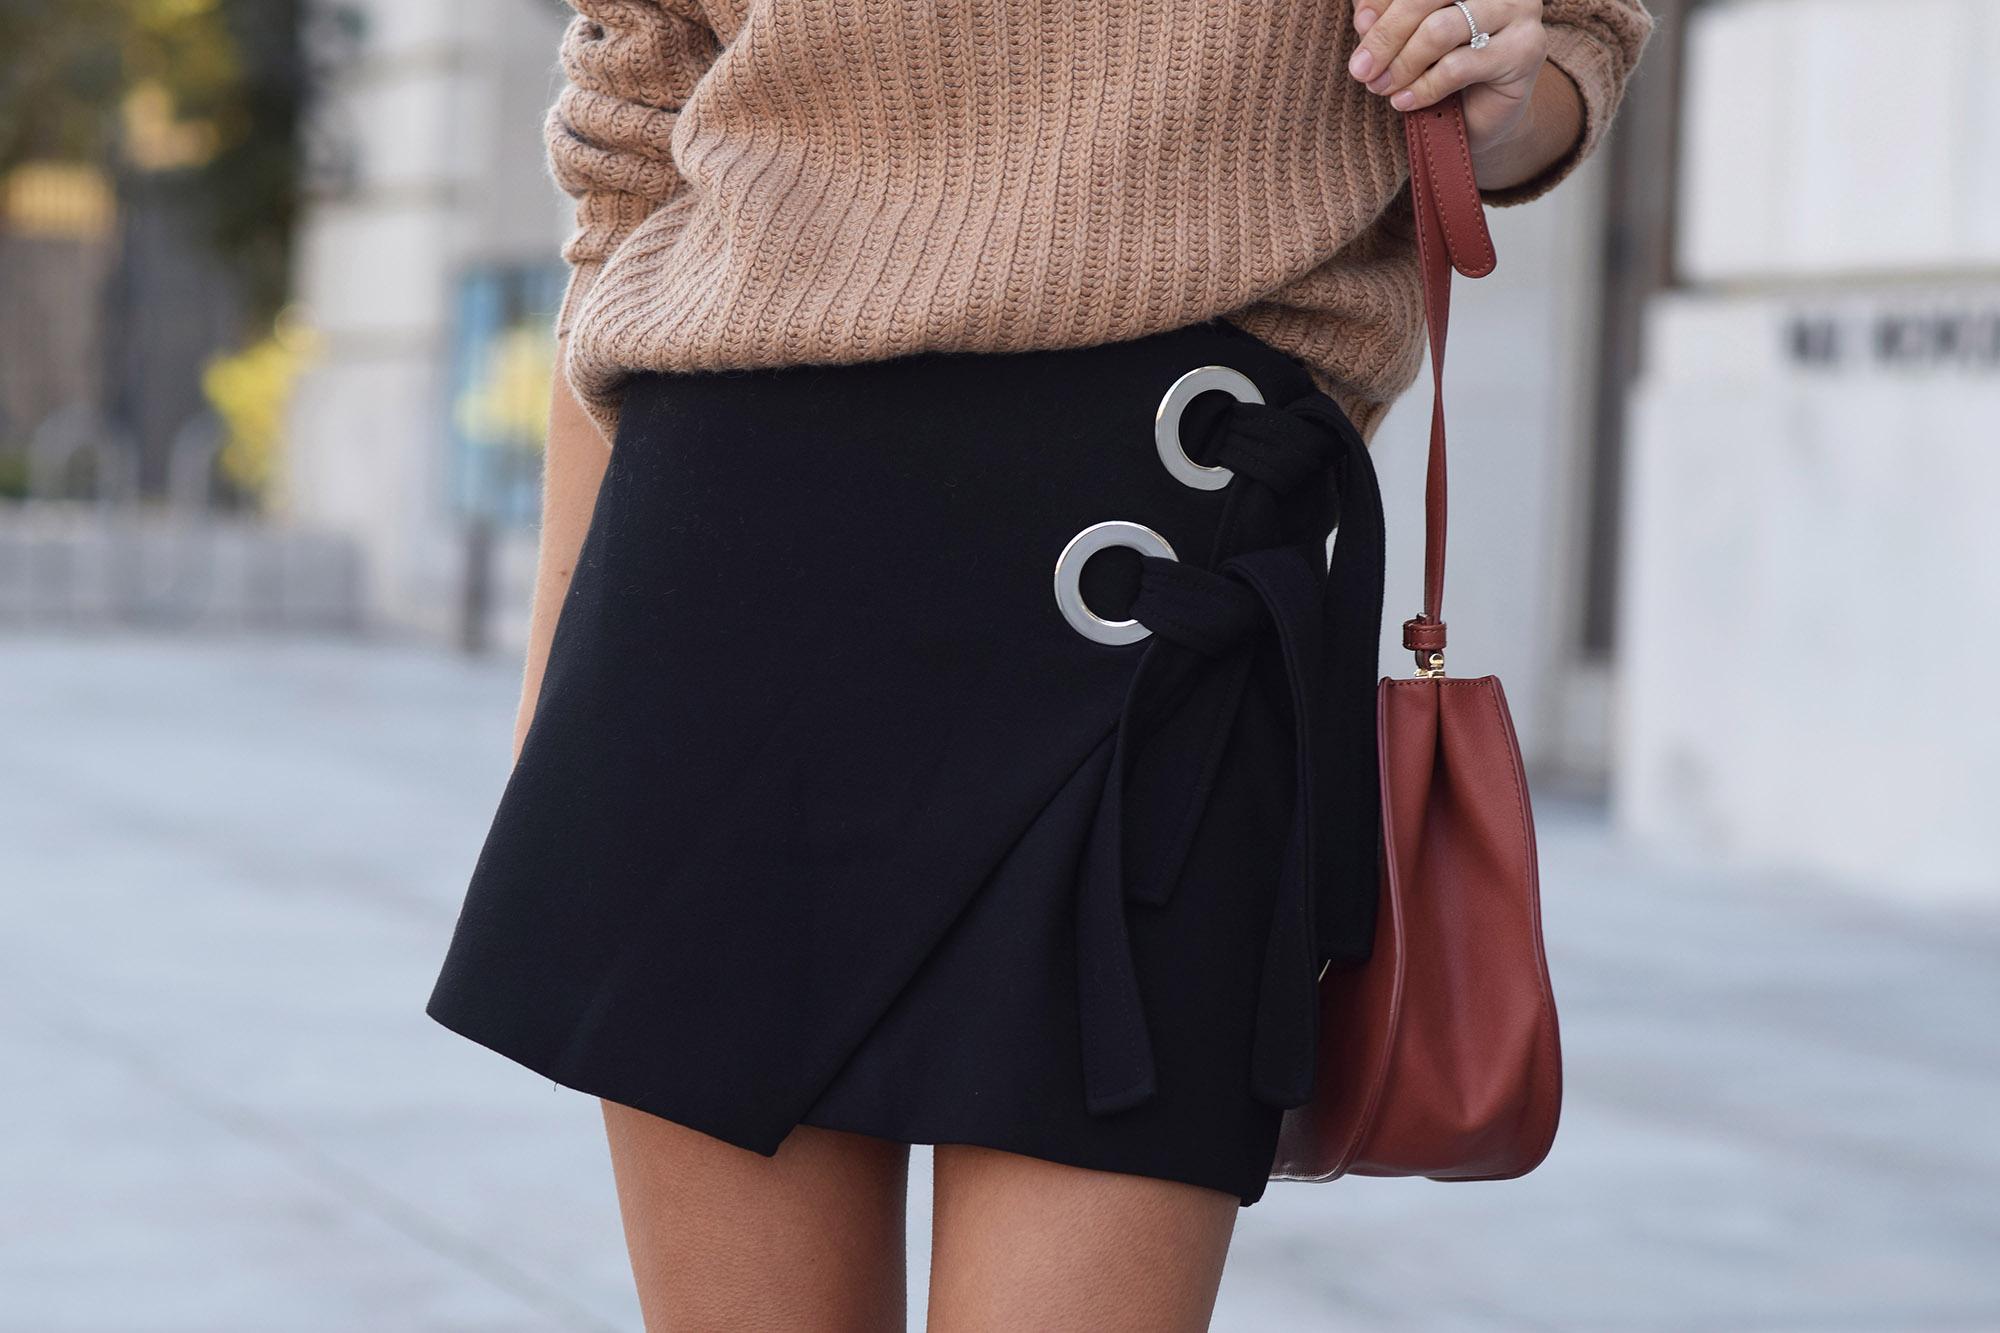 zara-tie-up-skirt